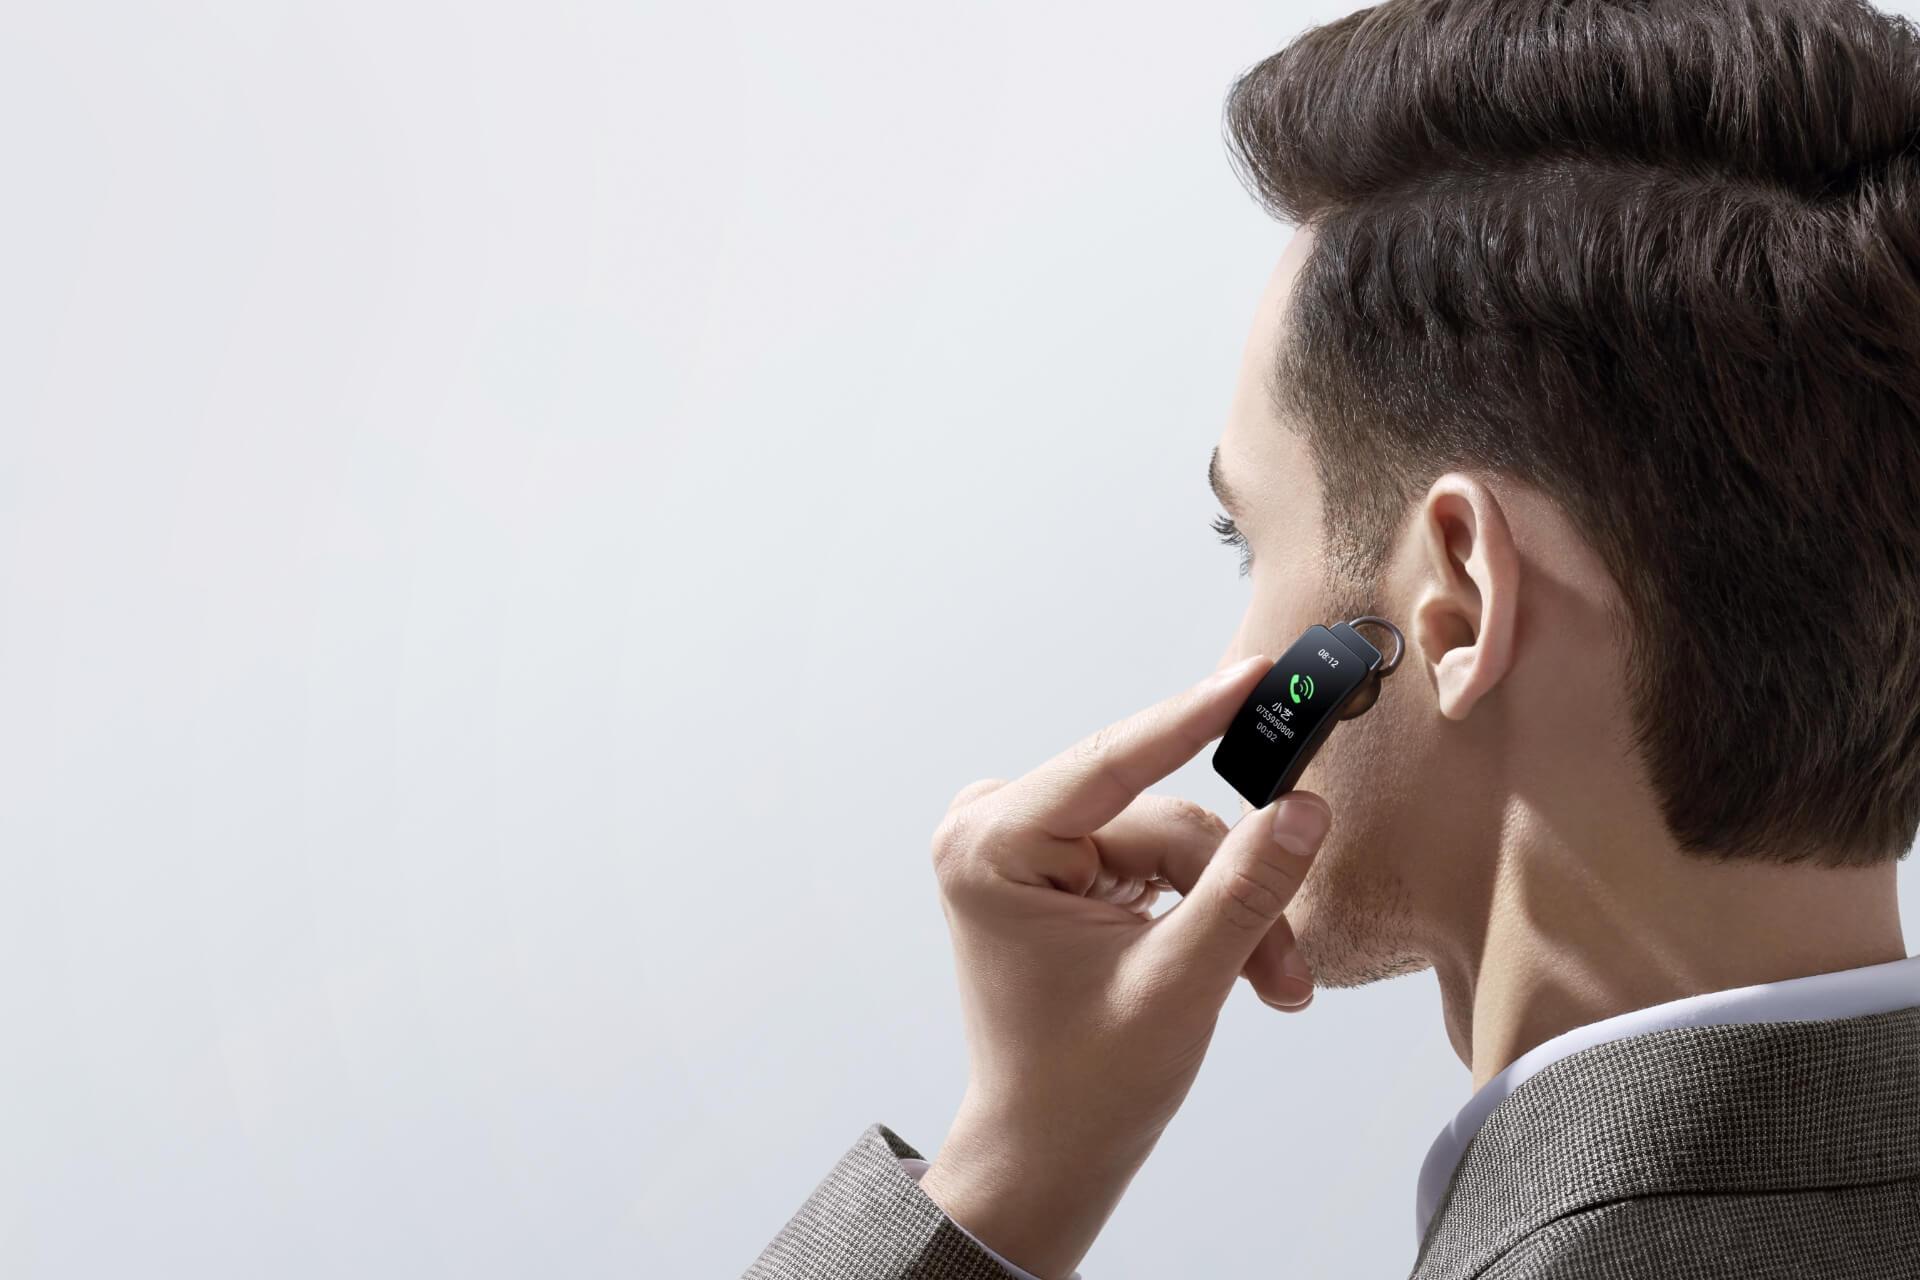 opaska słuchawka Bluetooth Huawei Band B6 headset